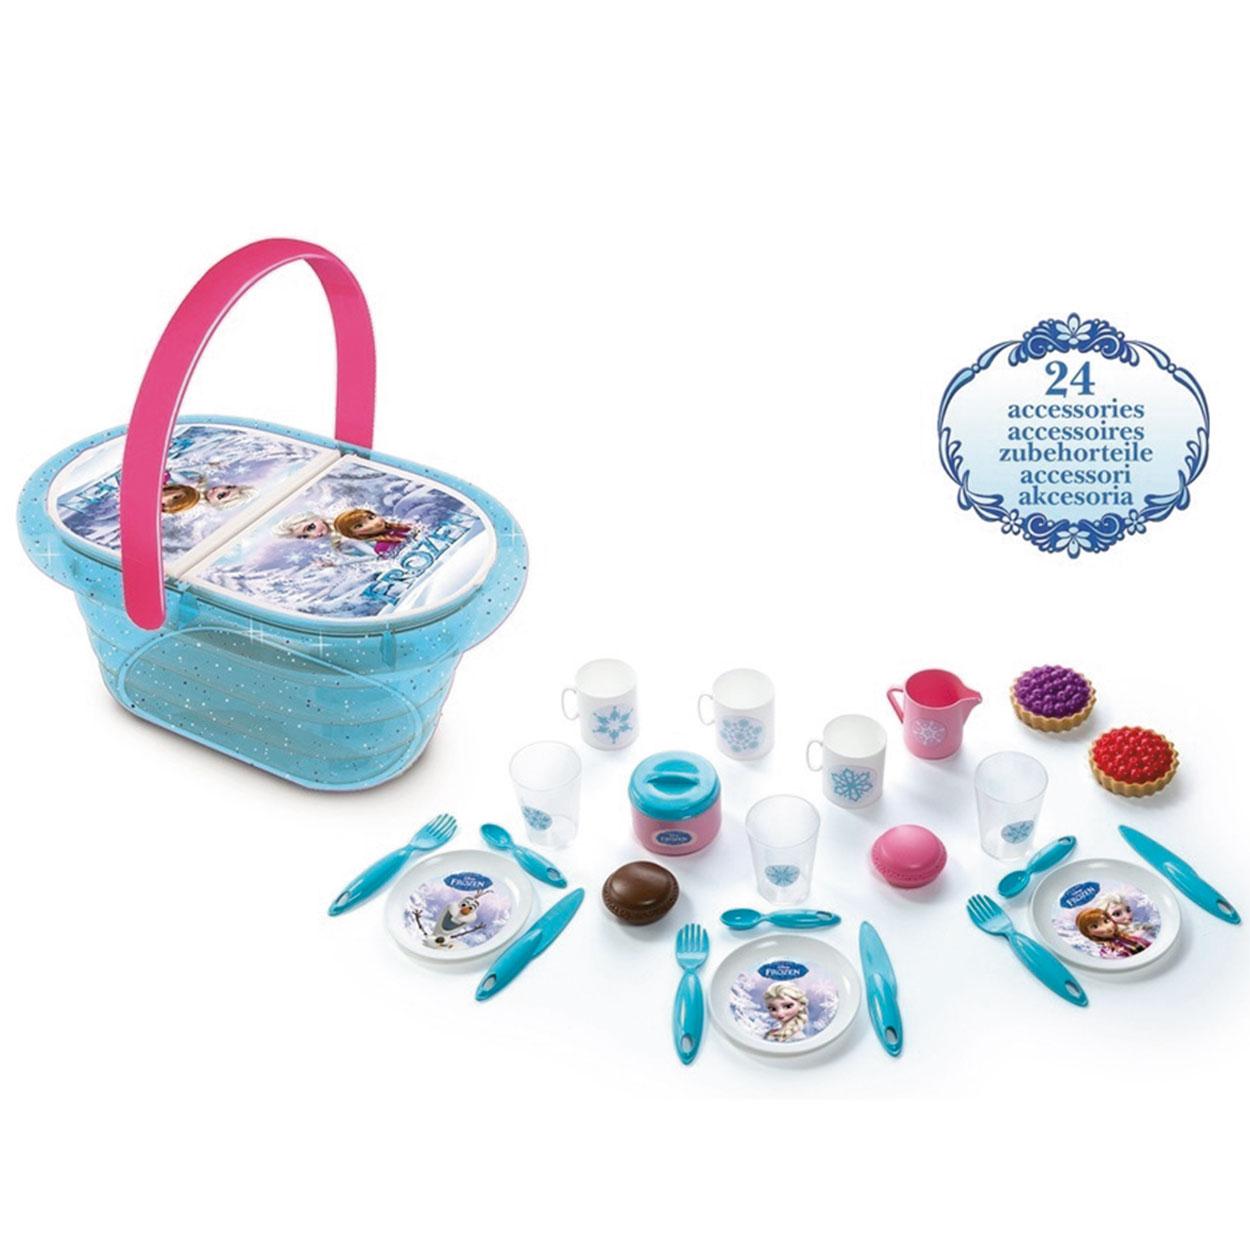 Smoby Disney Frozen Picknickmand online kopen Lobbes nl